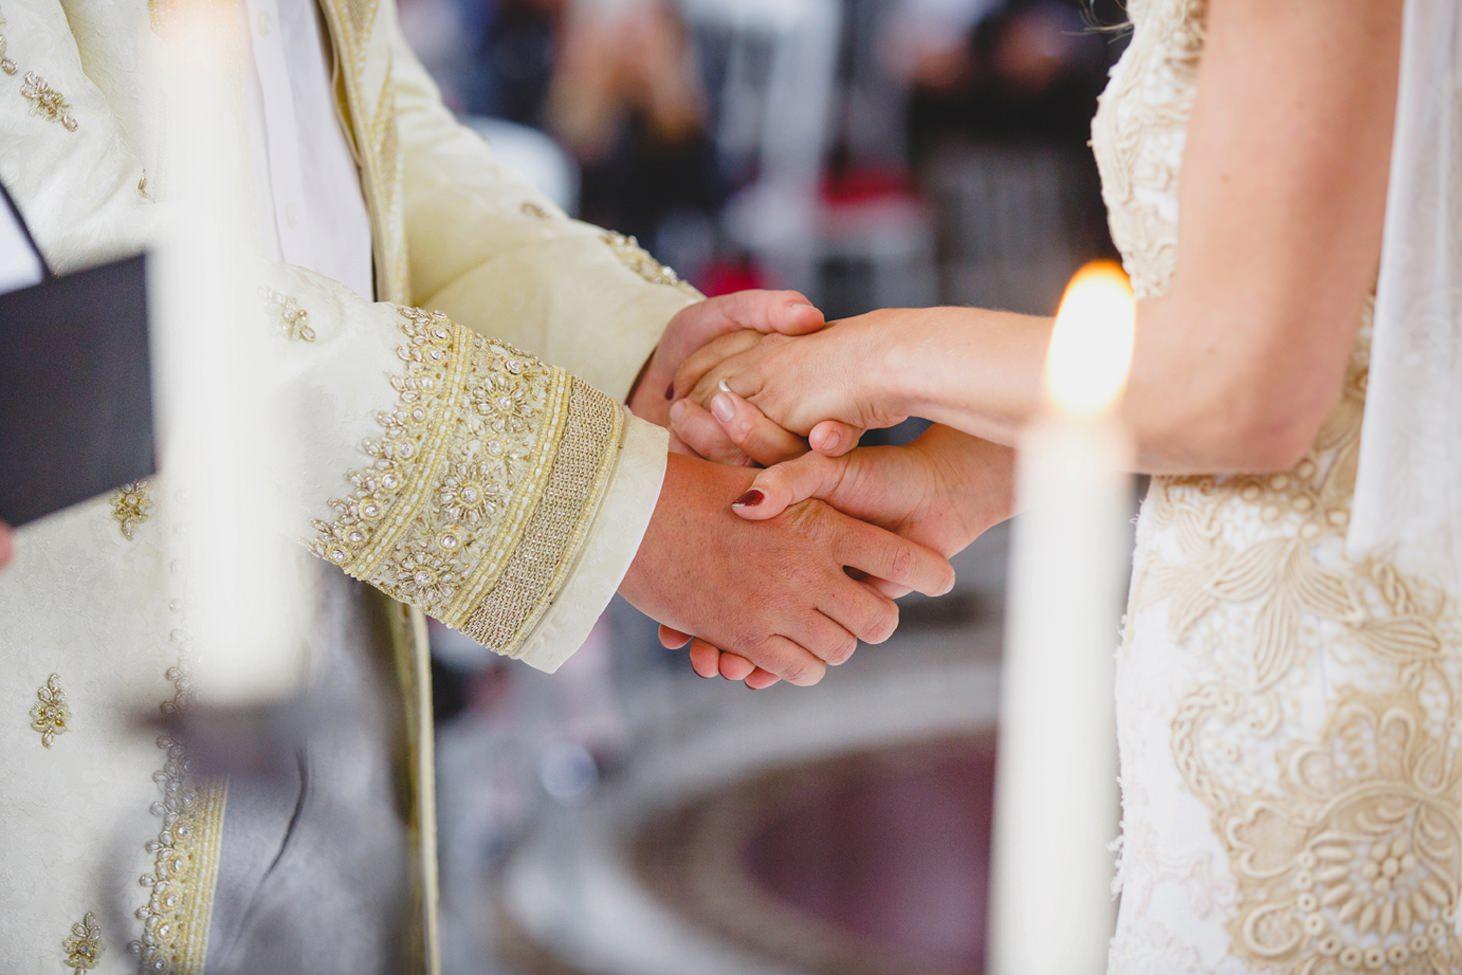 mount stuart wedding photography bride and grooms hands